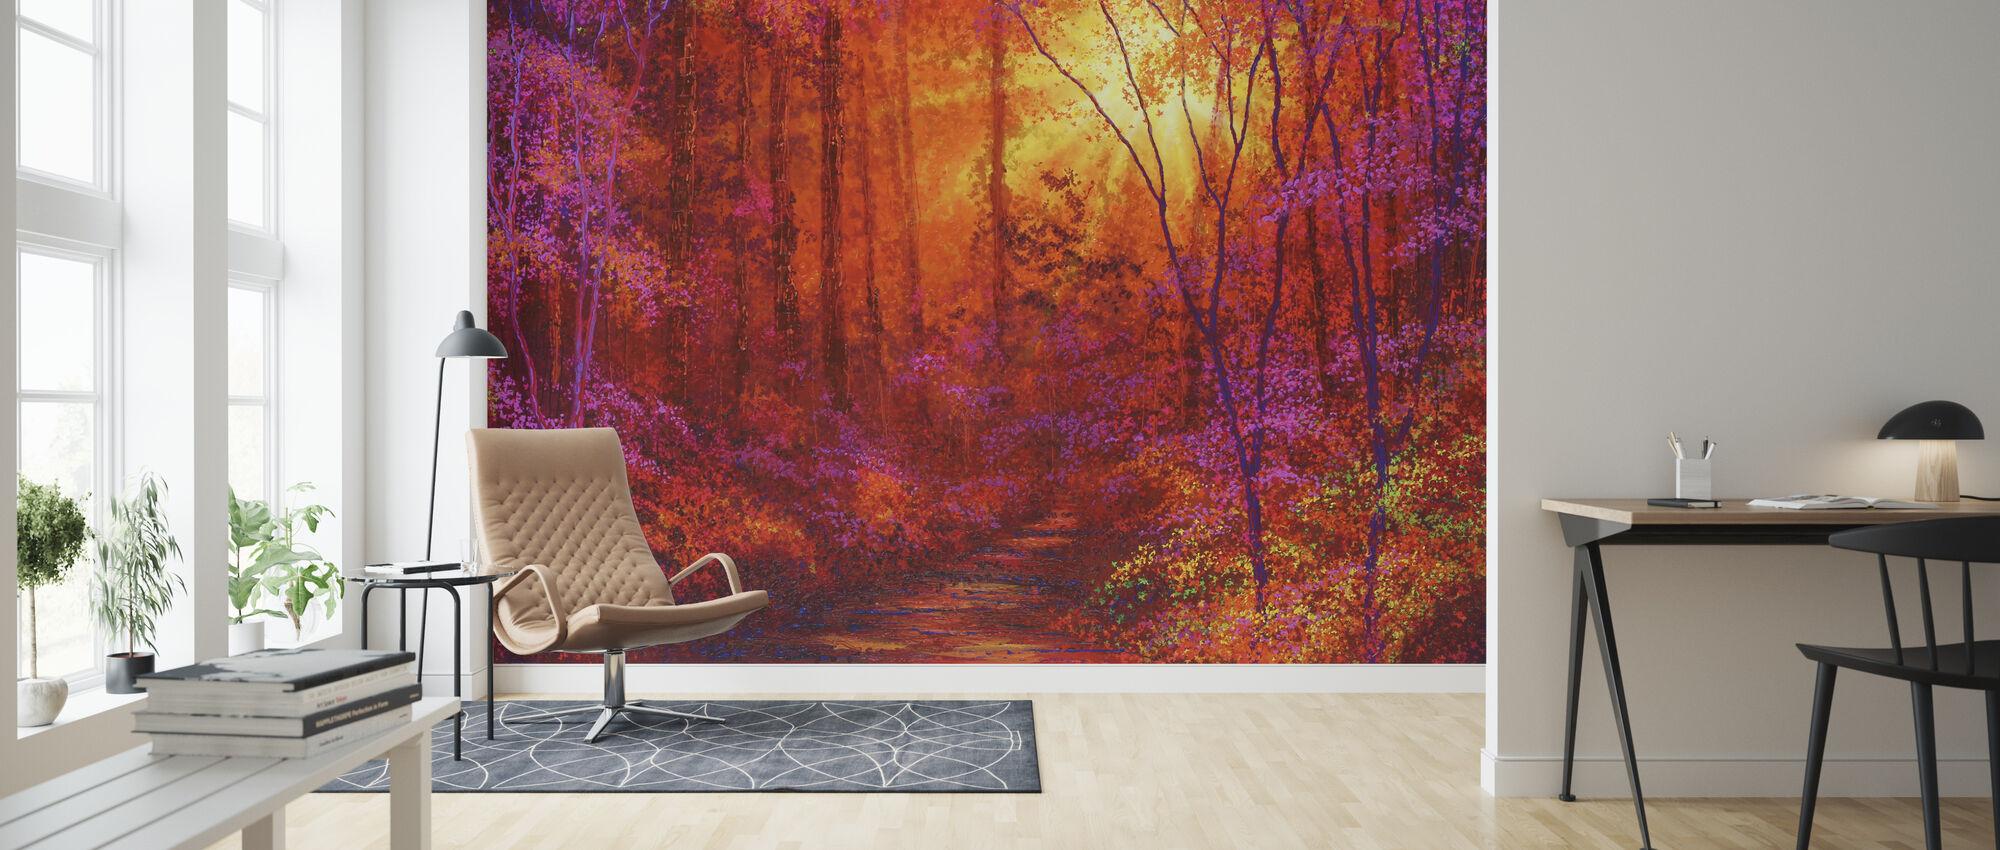 Ruby Forest - Wallpaper - Living Room